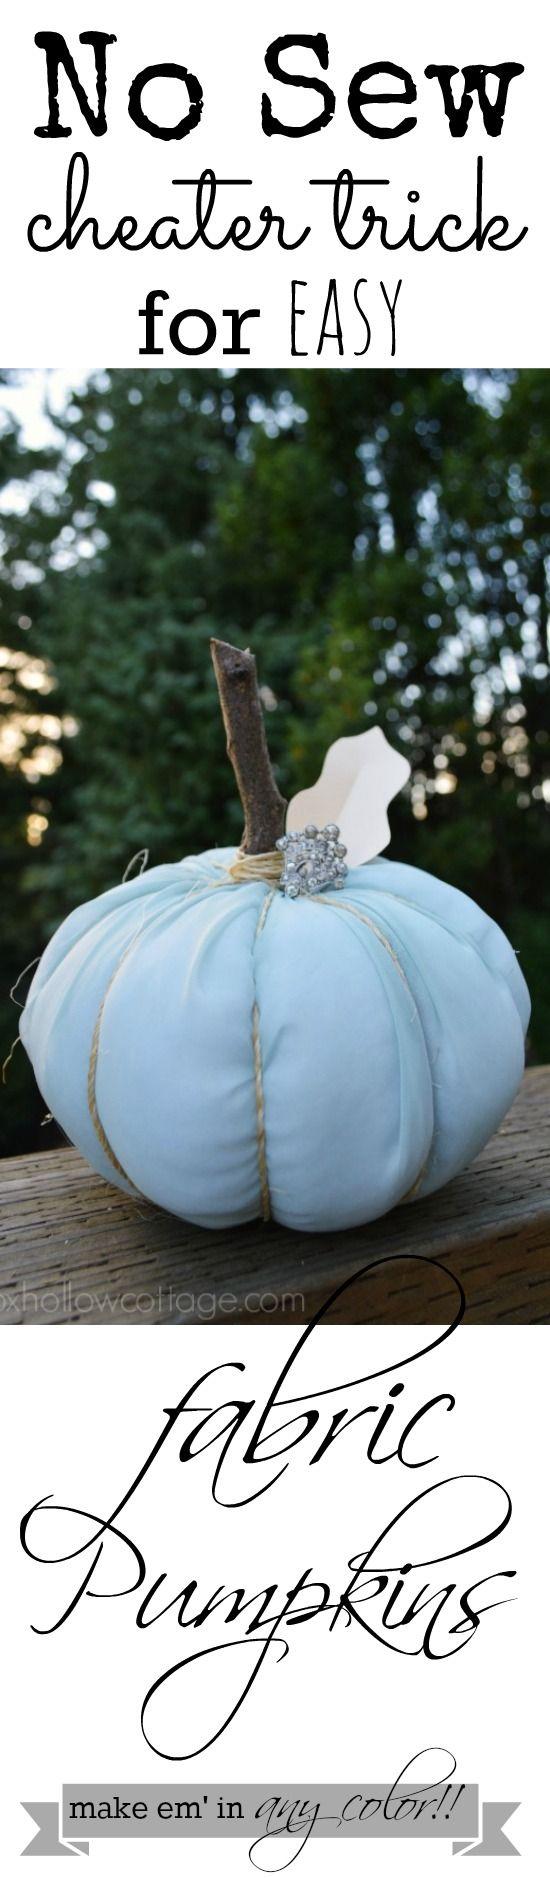 NO SEW Fabric Pumpkin! Use any color to match your decor -- #fabricpumpkin #pumpkin #nosew